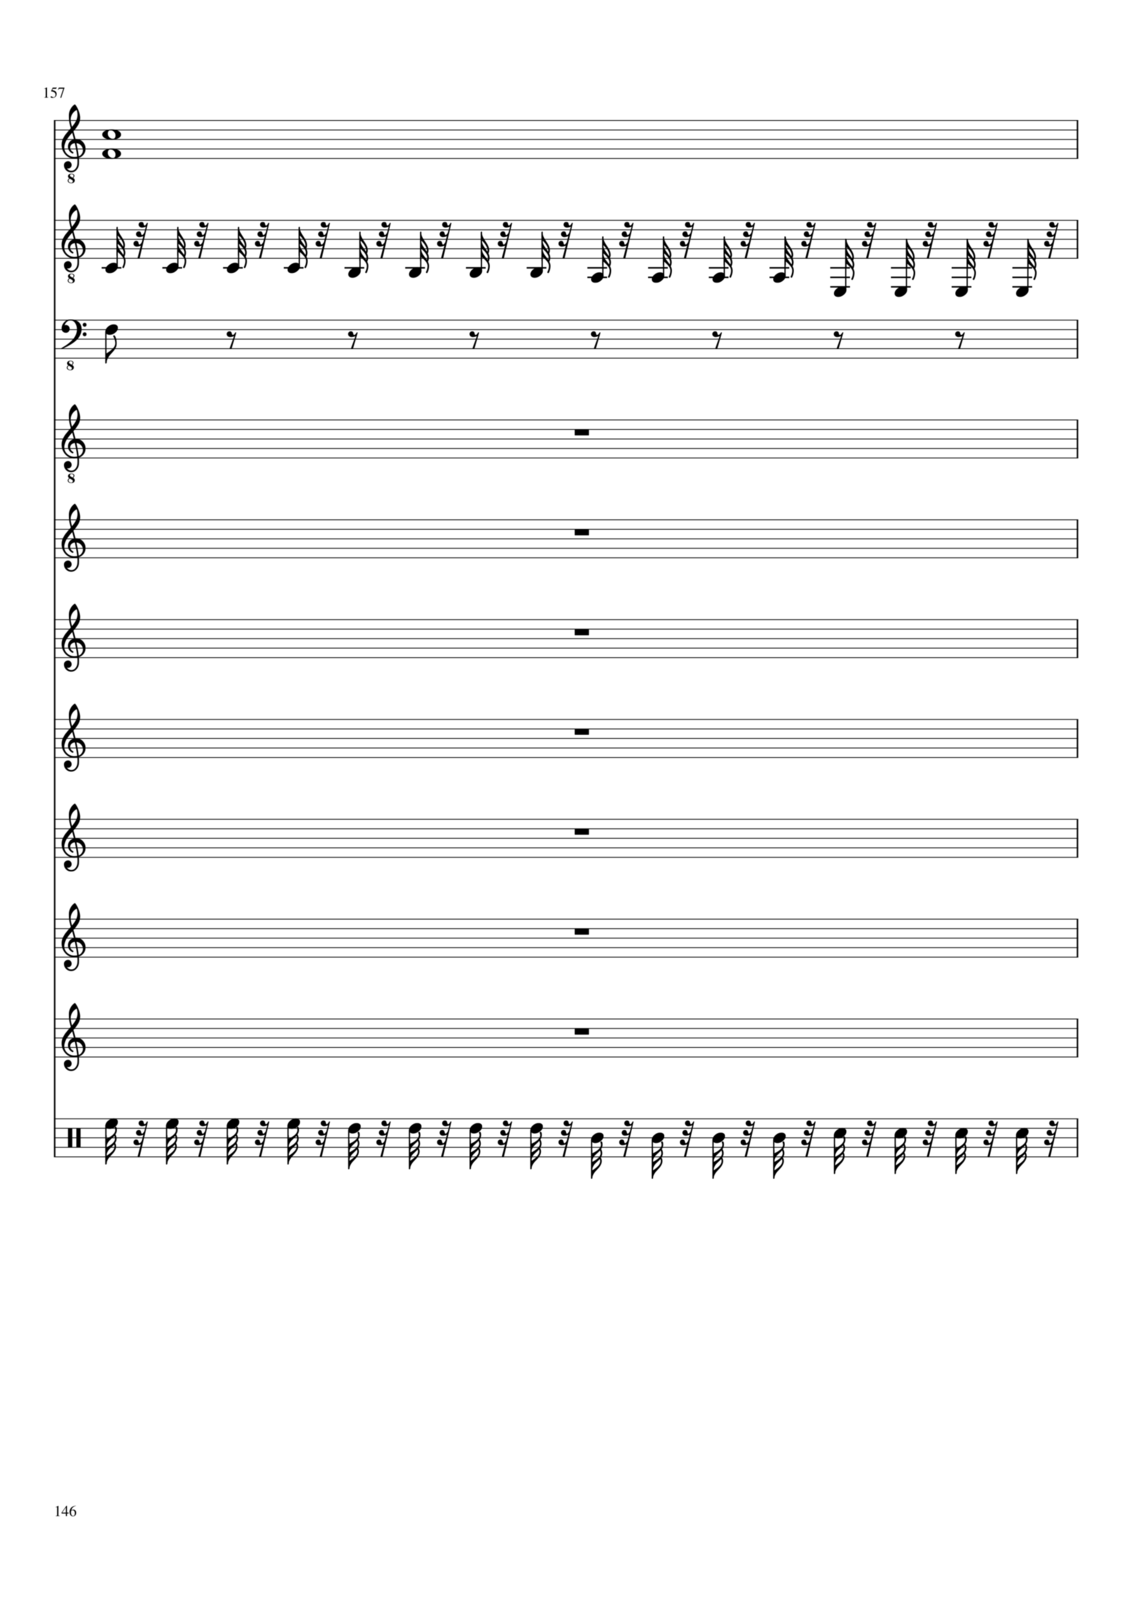 Belyiy sokol slide, Image 146